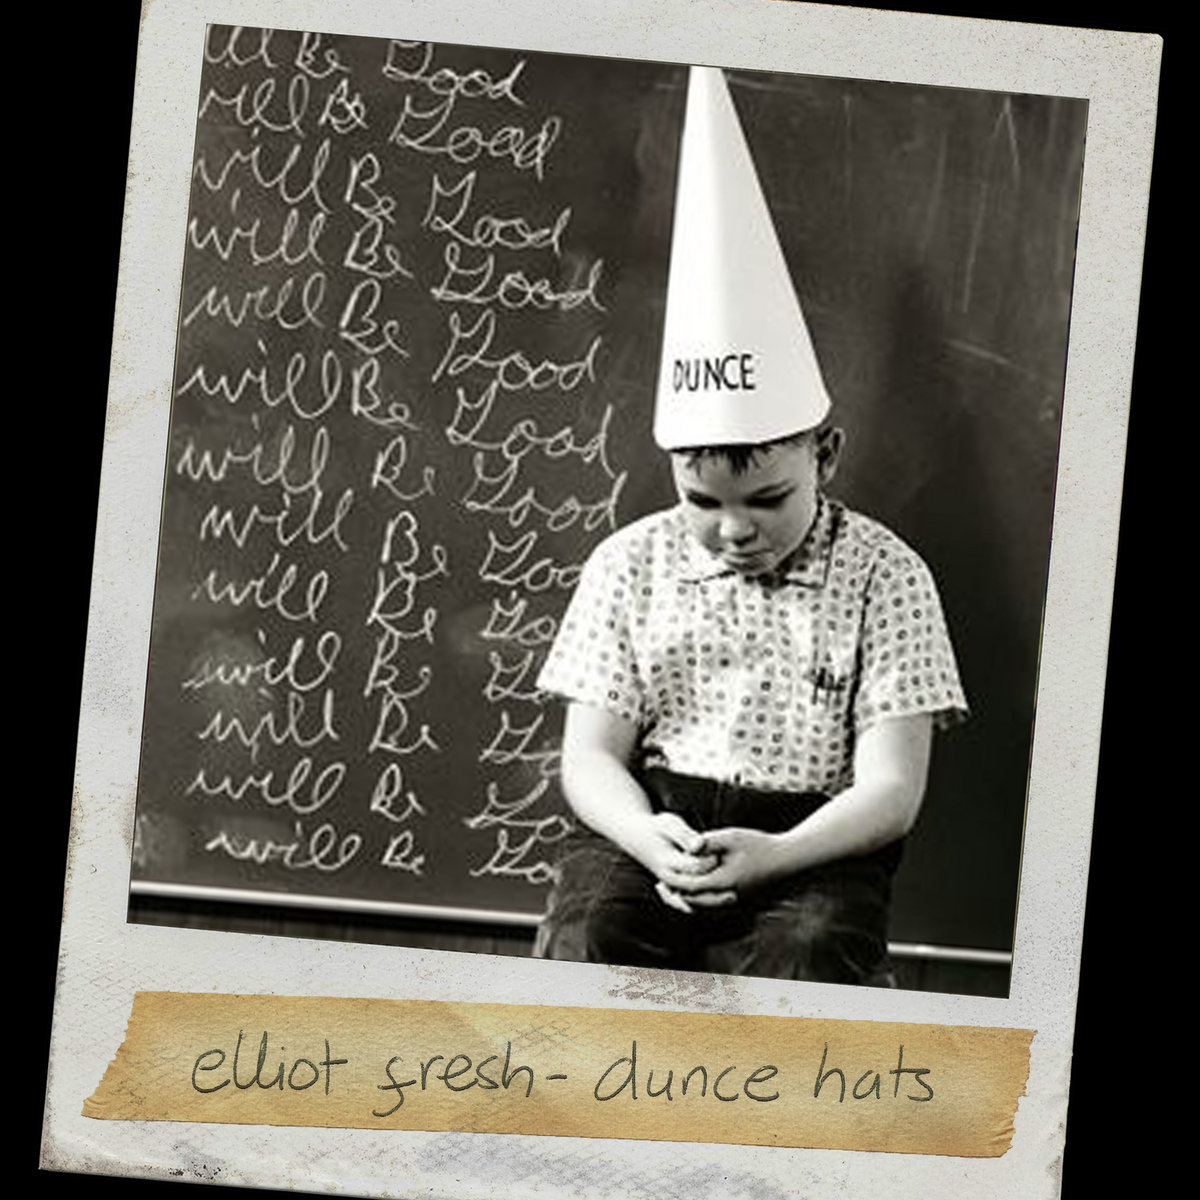 Dunce Hats Boom Bap Pro